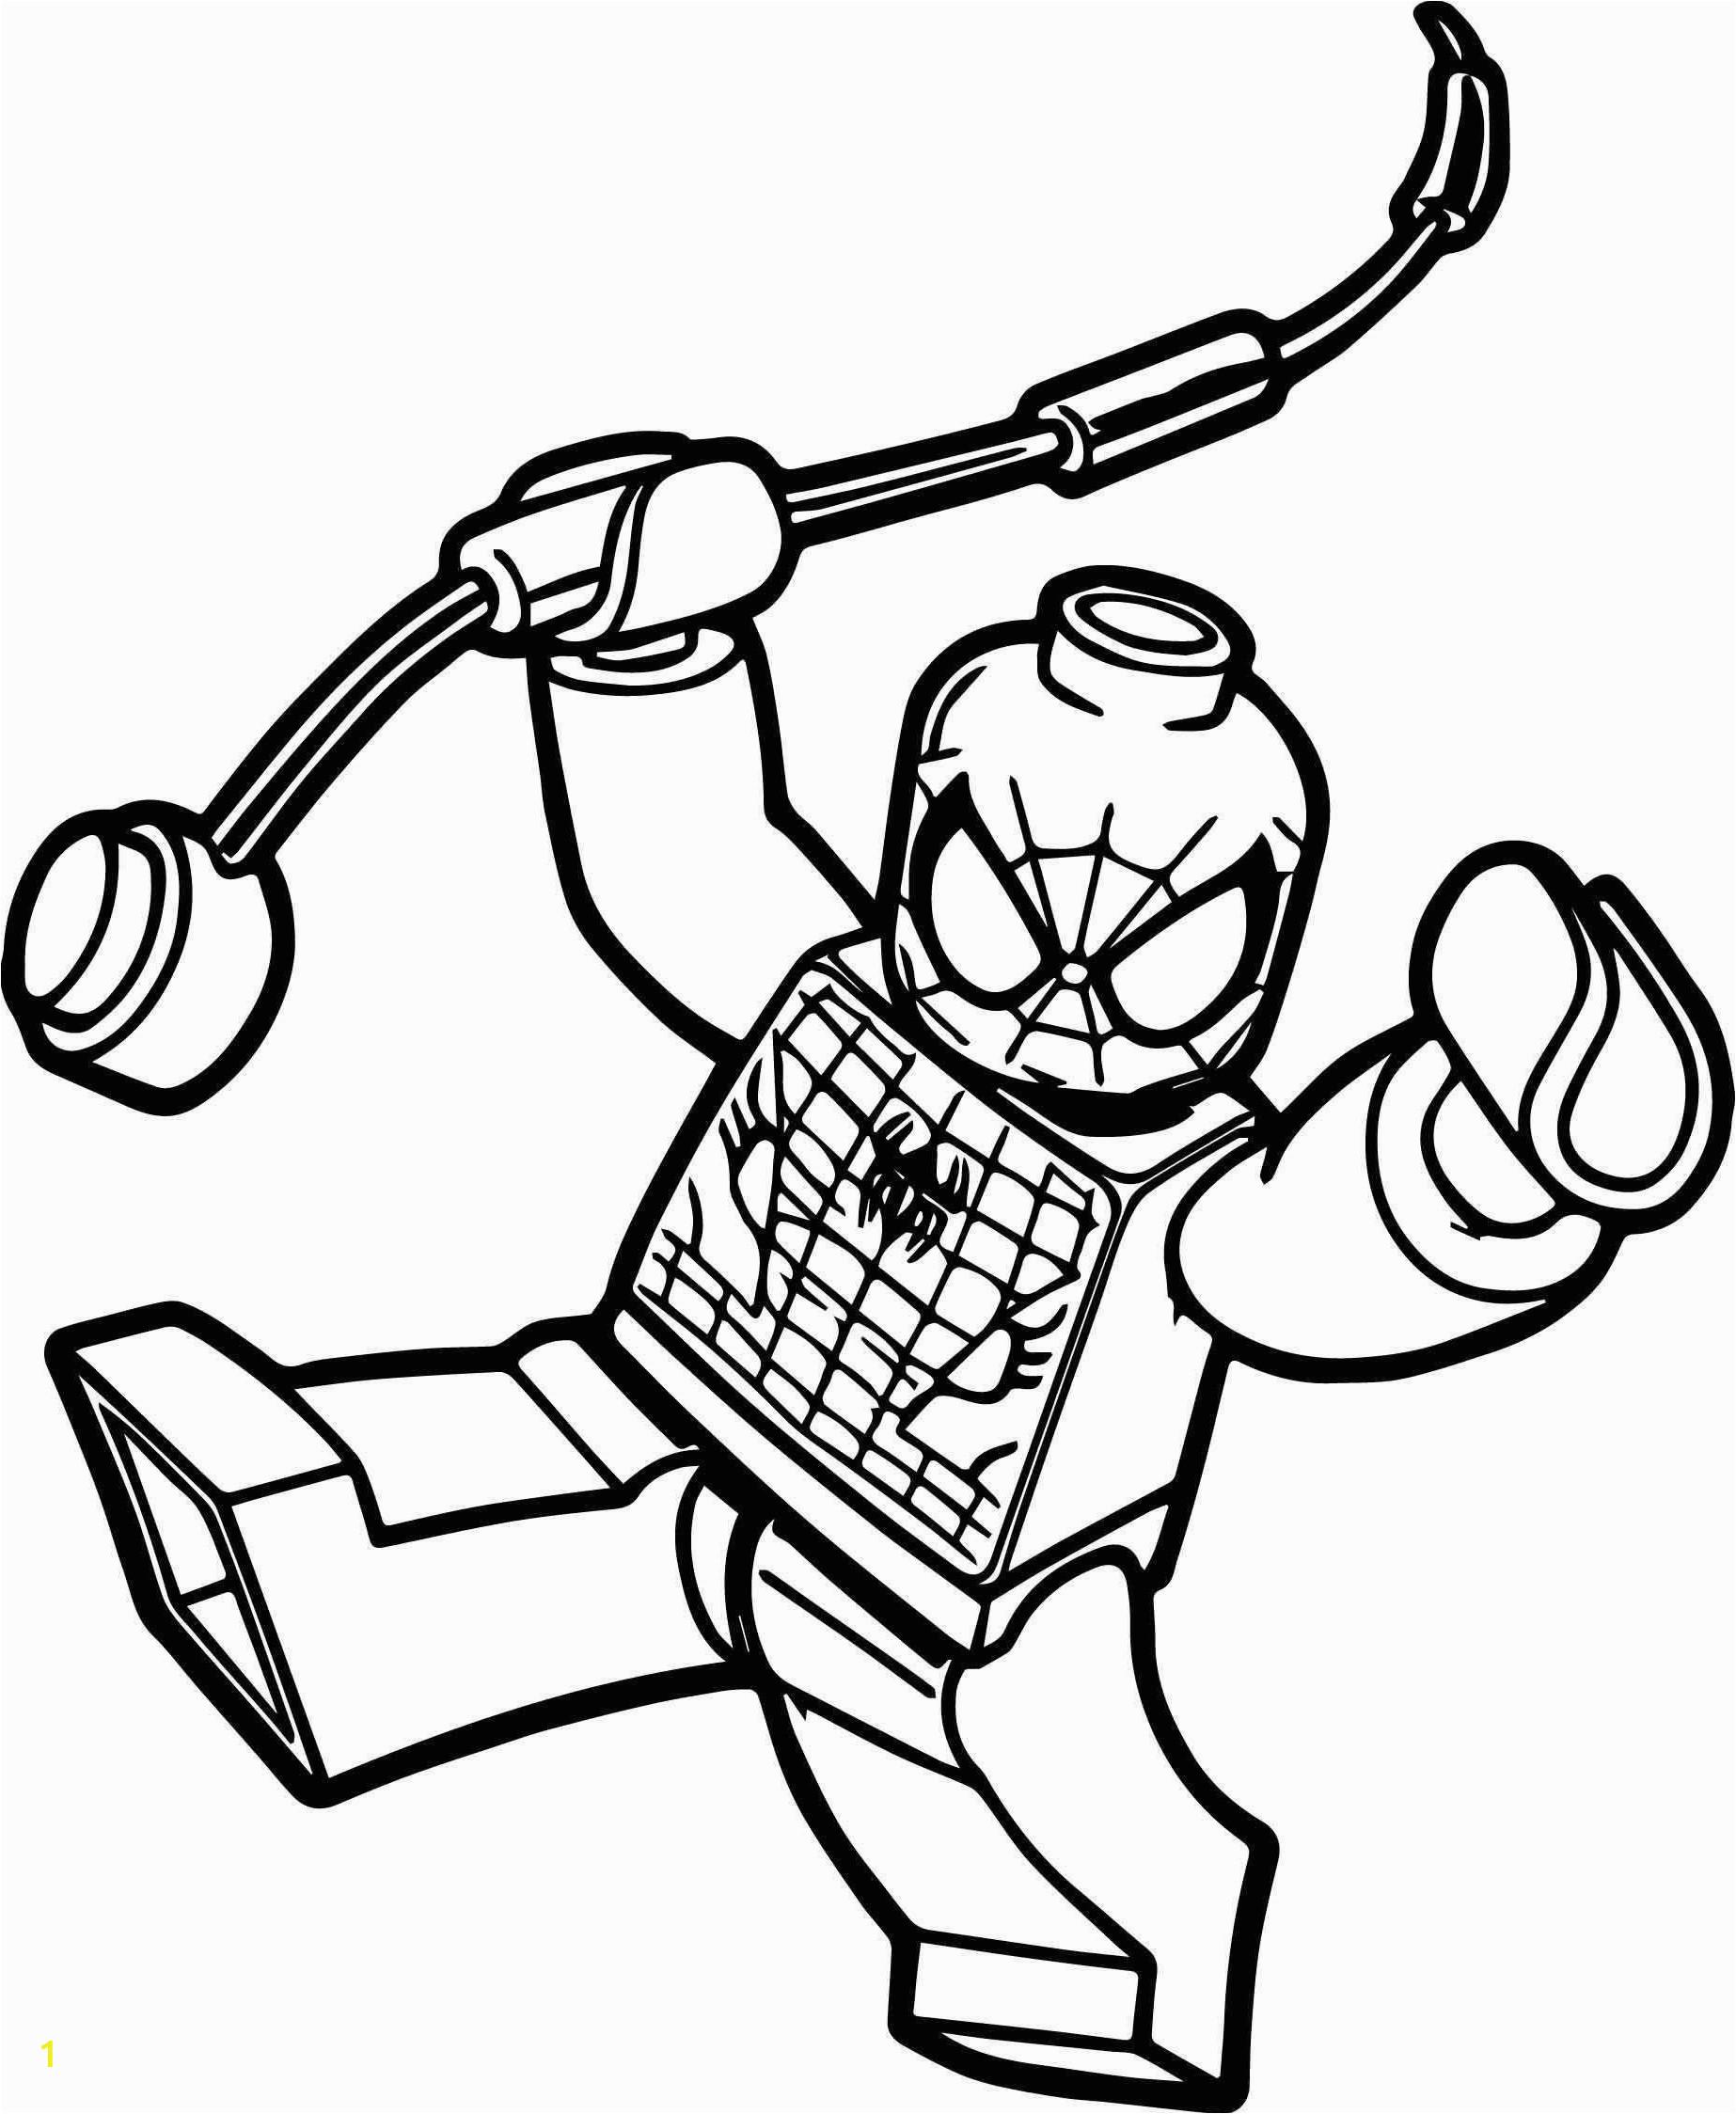 the hulk coloring page new image iron man coloring pages of the hulk coloring page